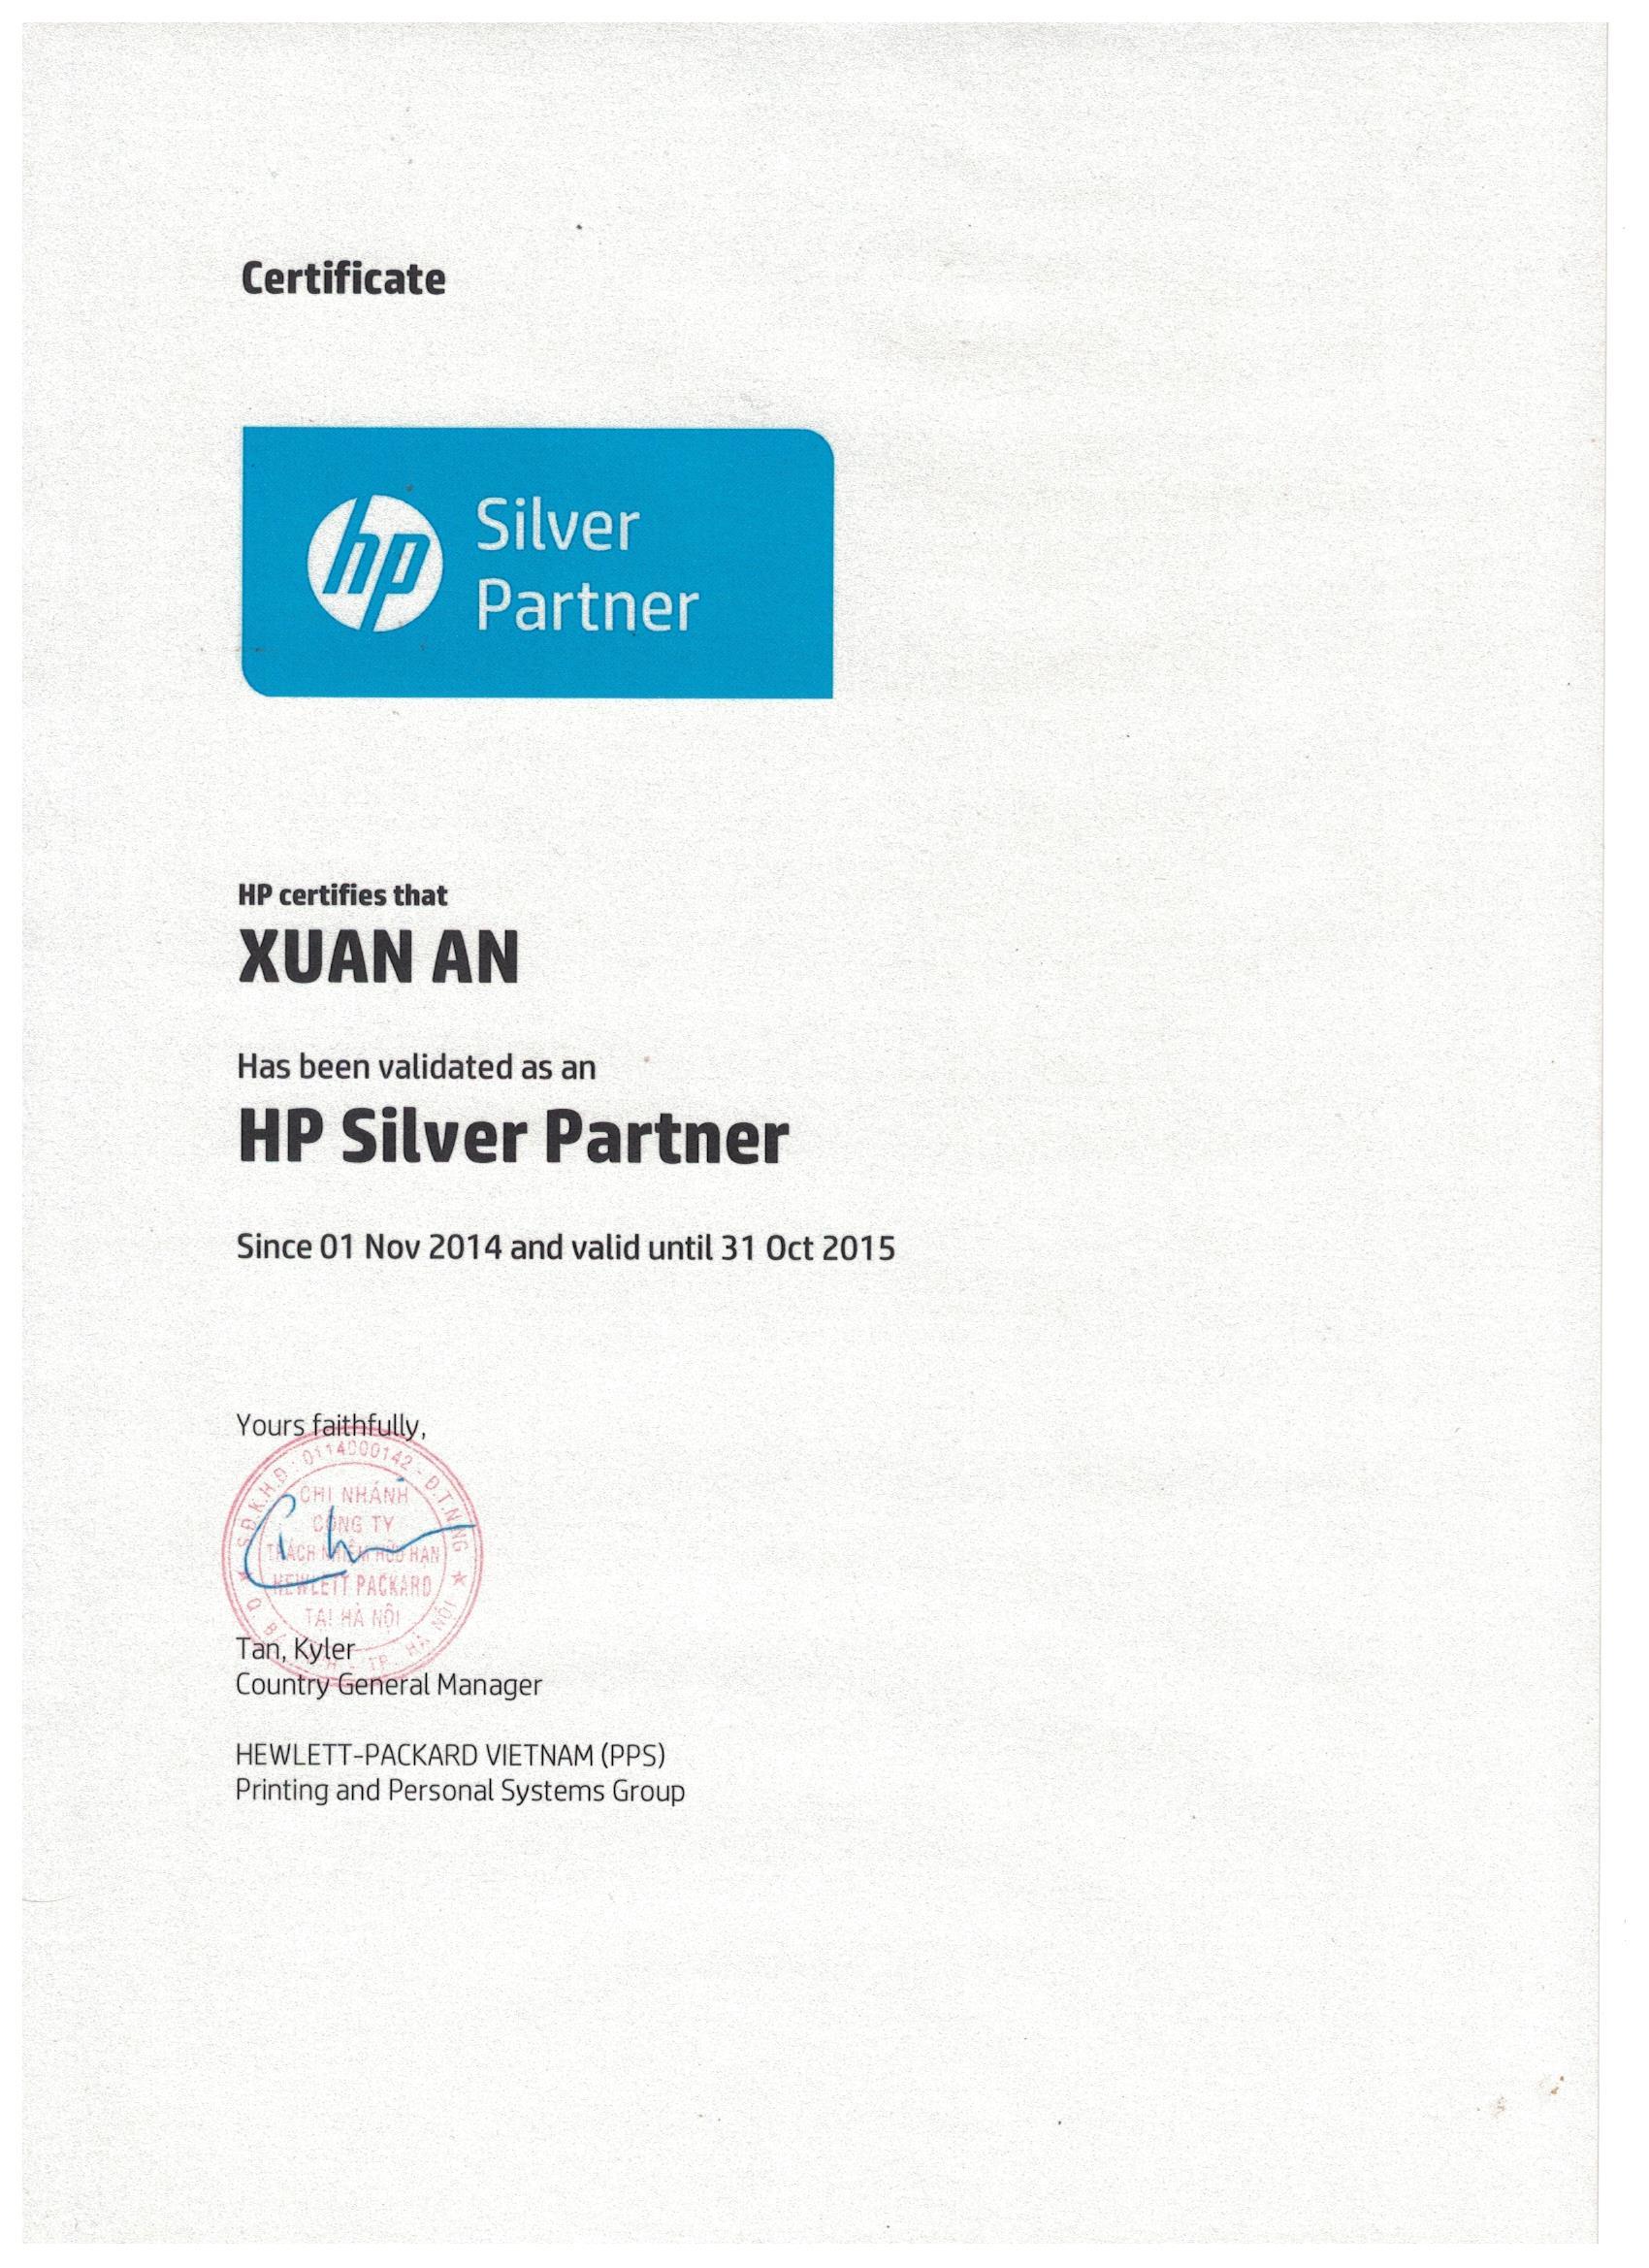 HP Probook 450 G7 - 9GQ26PA (Silver)